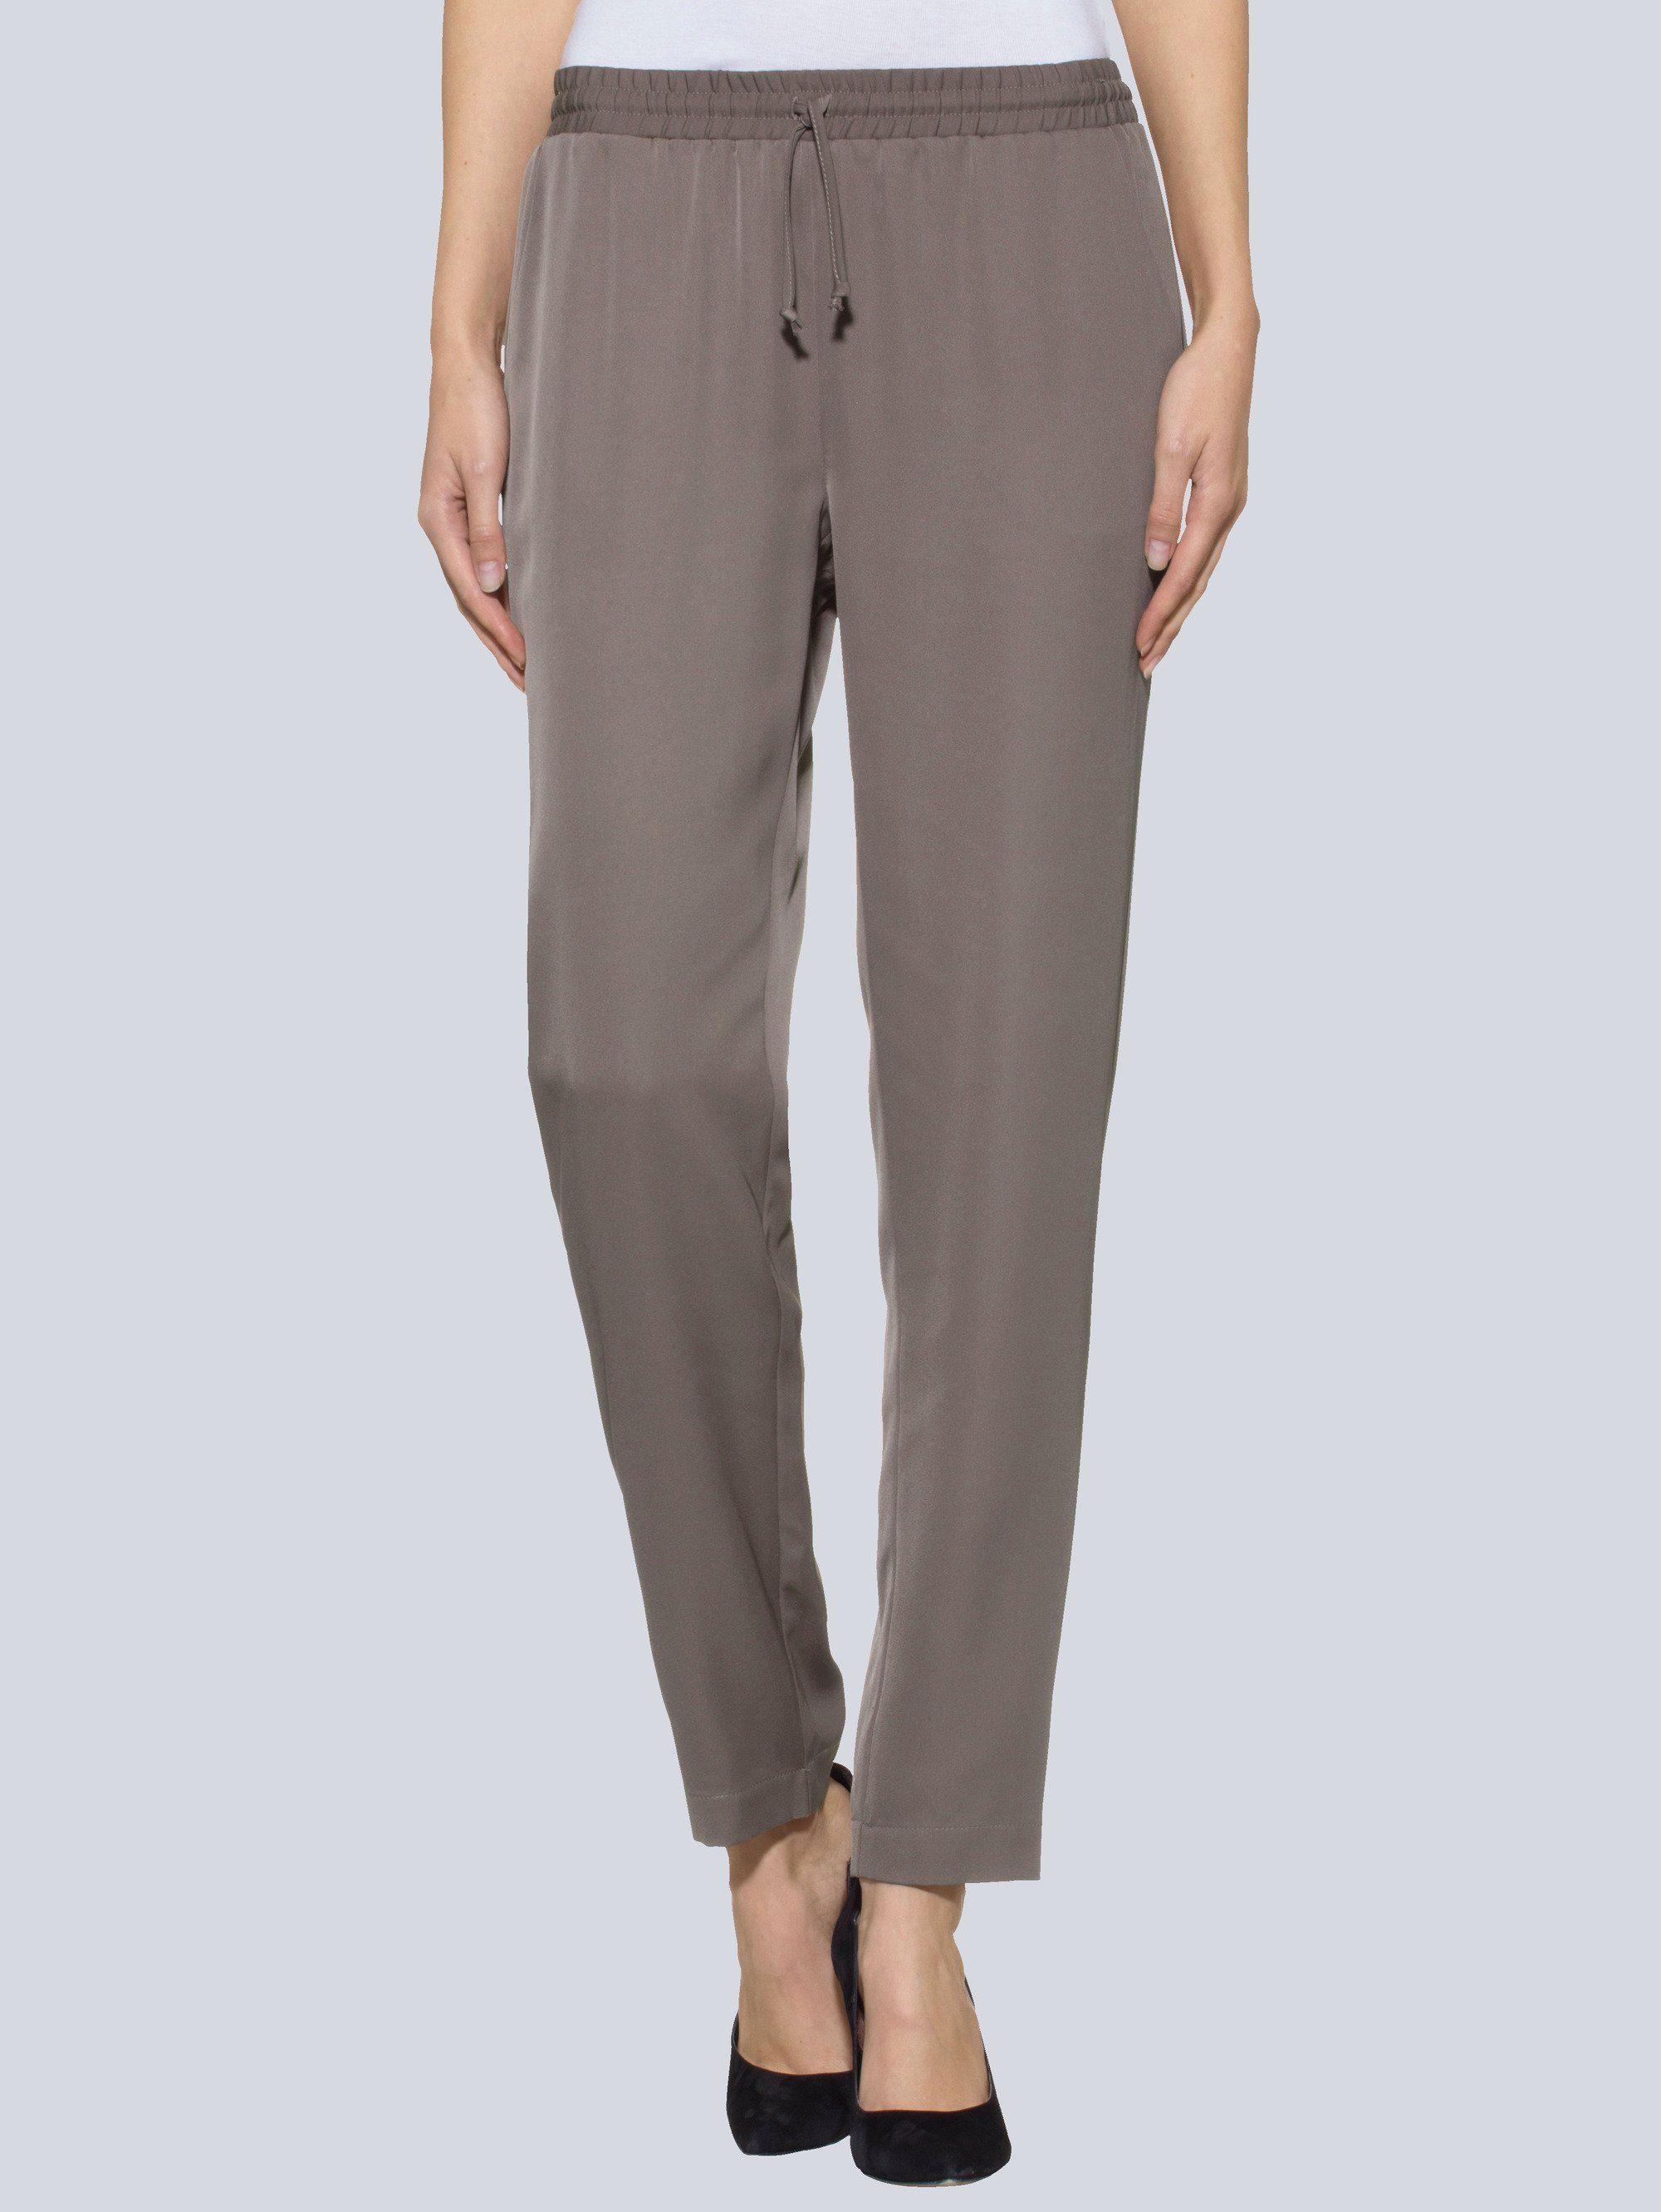 Alba Moda Joggpants aus weichfallendem Materialmix | Bekleidung > Hosen > Gerade Hosen | Polyester | ALBA MODA